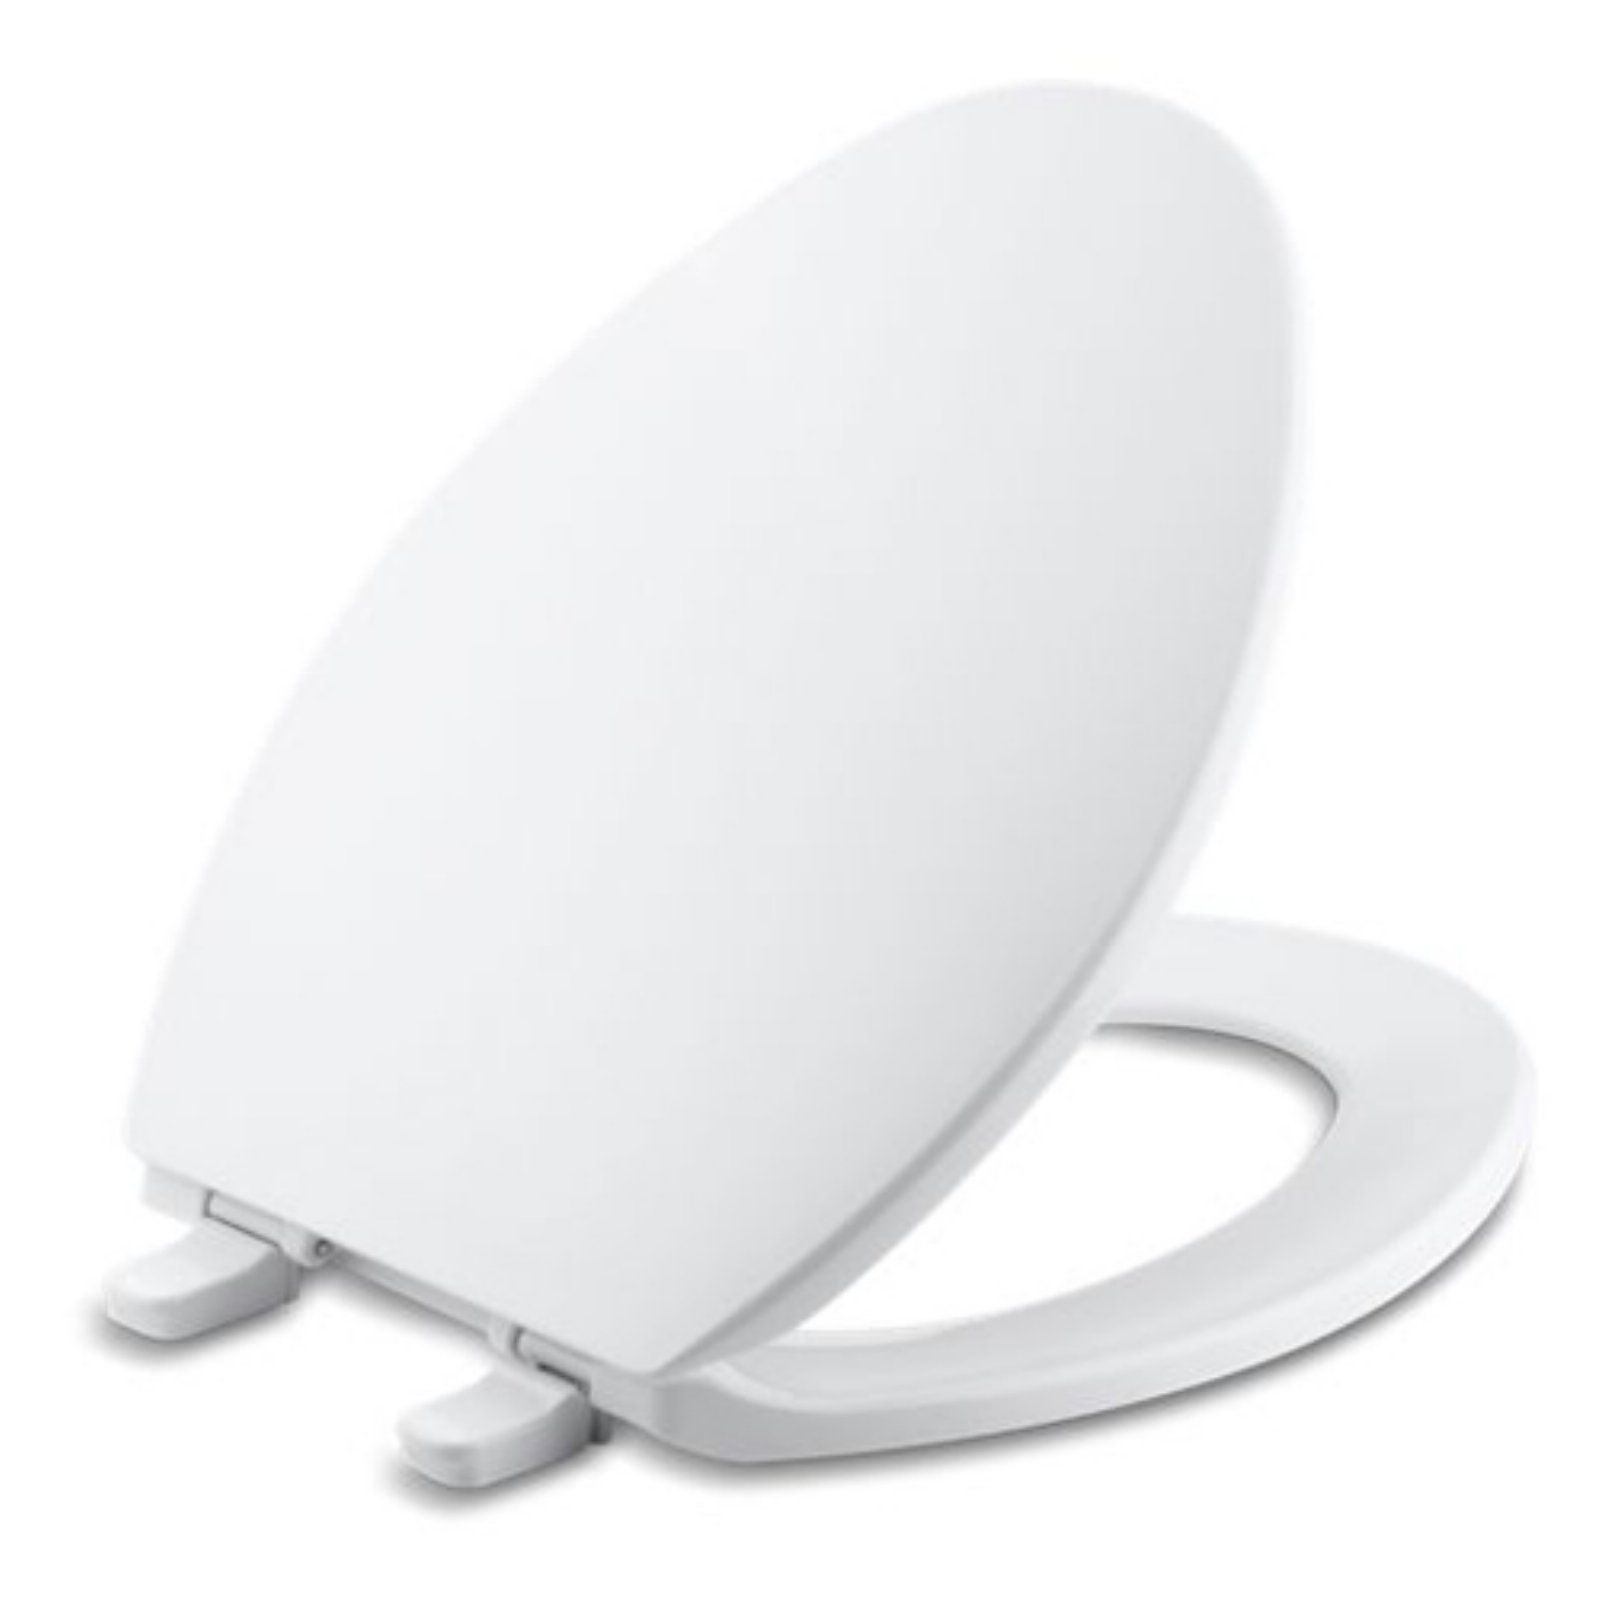 Excellent Kohler Brevia With Quick Release Hinges Elongated Toilet Machost Co Dining Chair Design Ideas Machostcouk